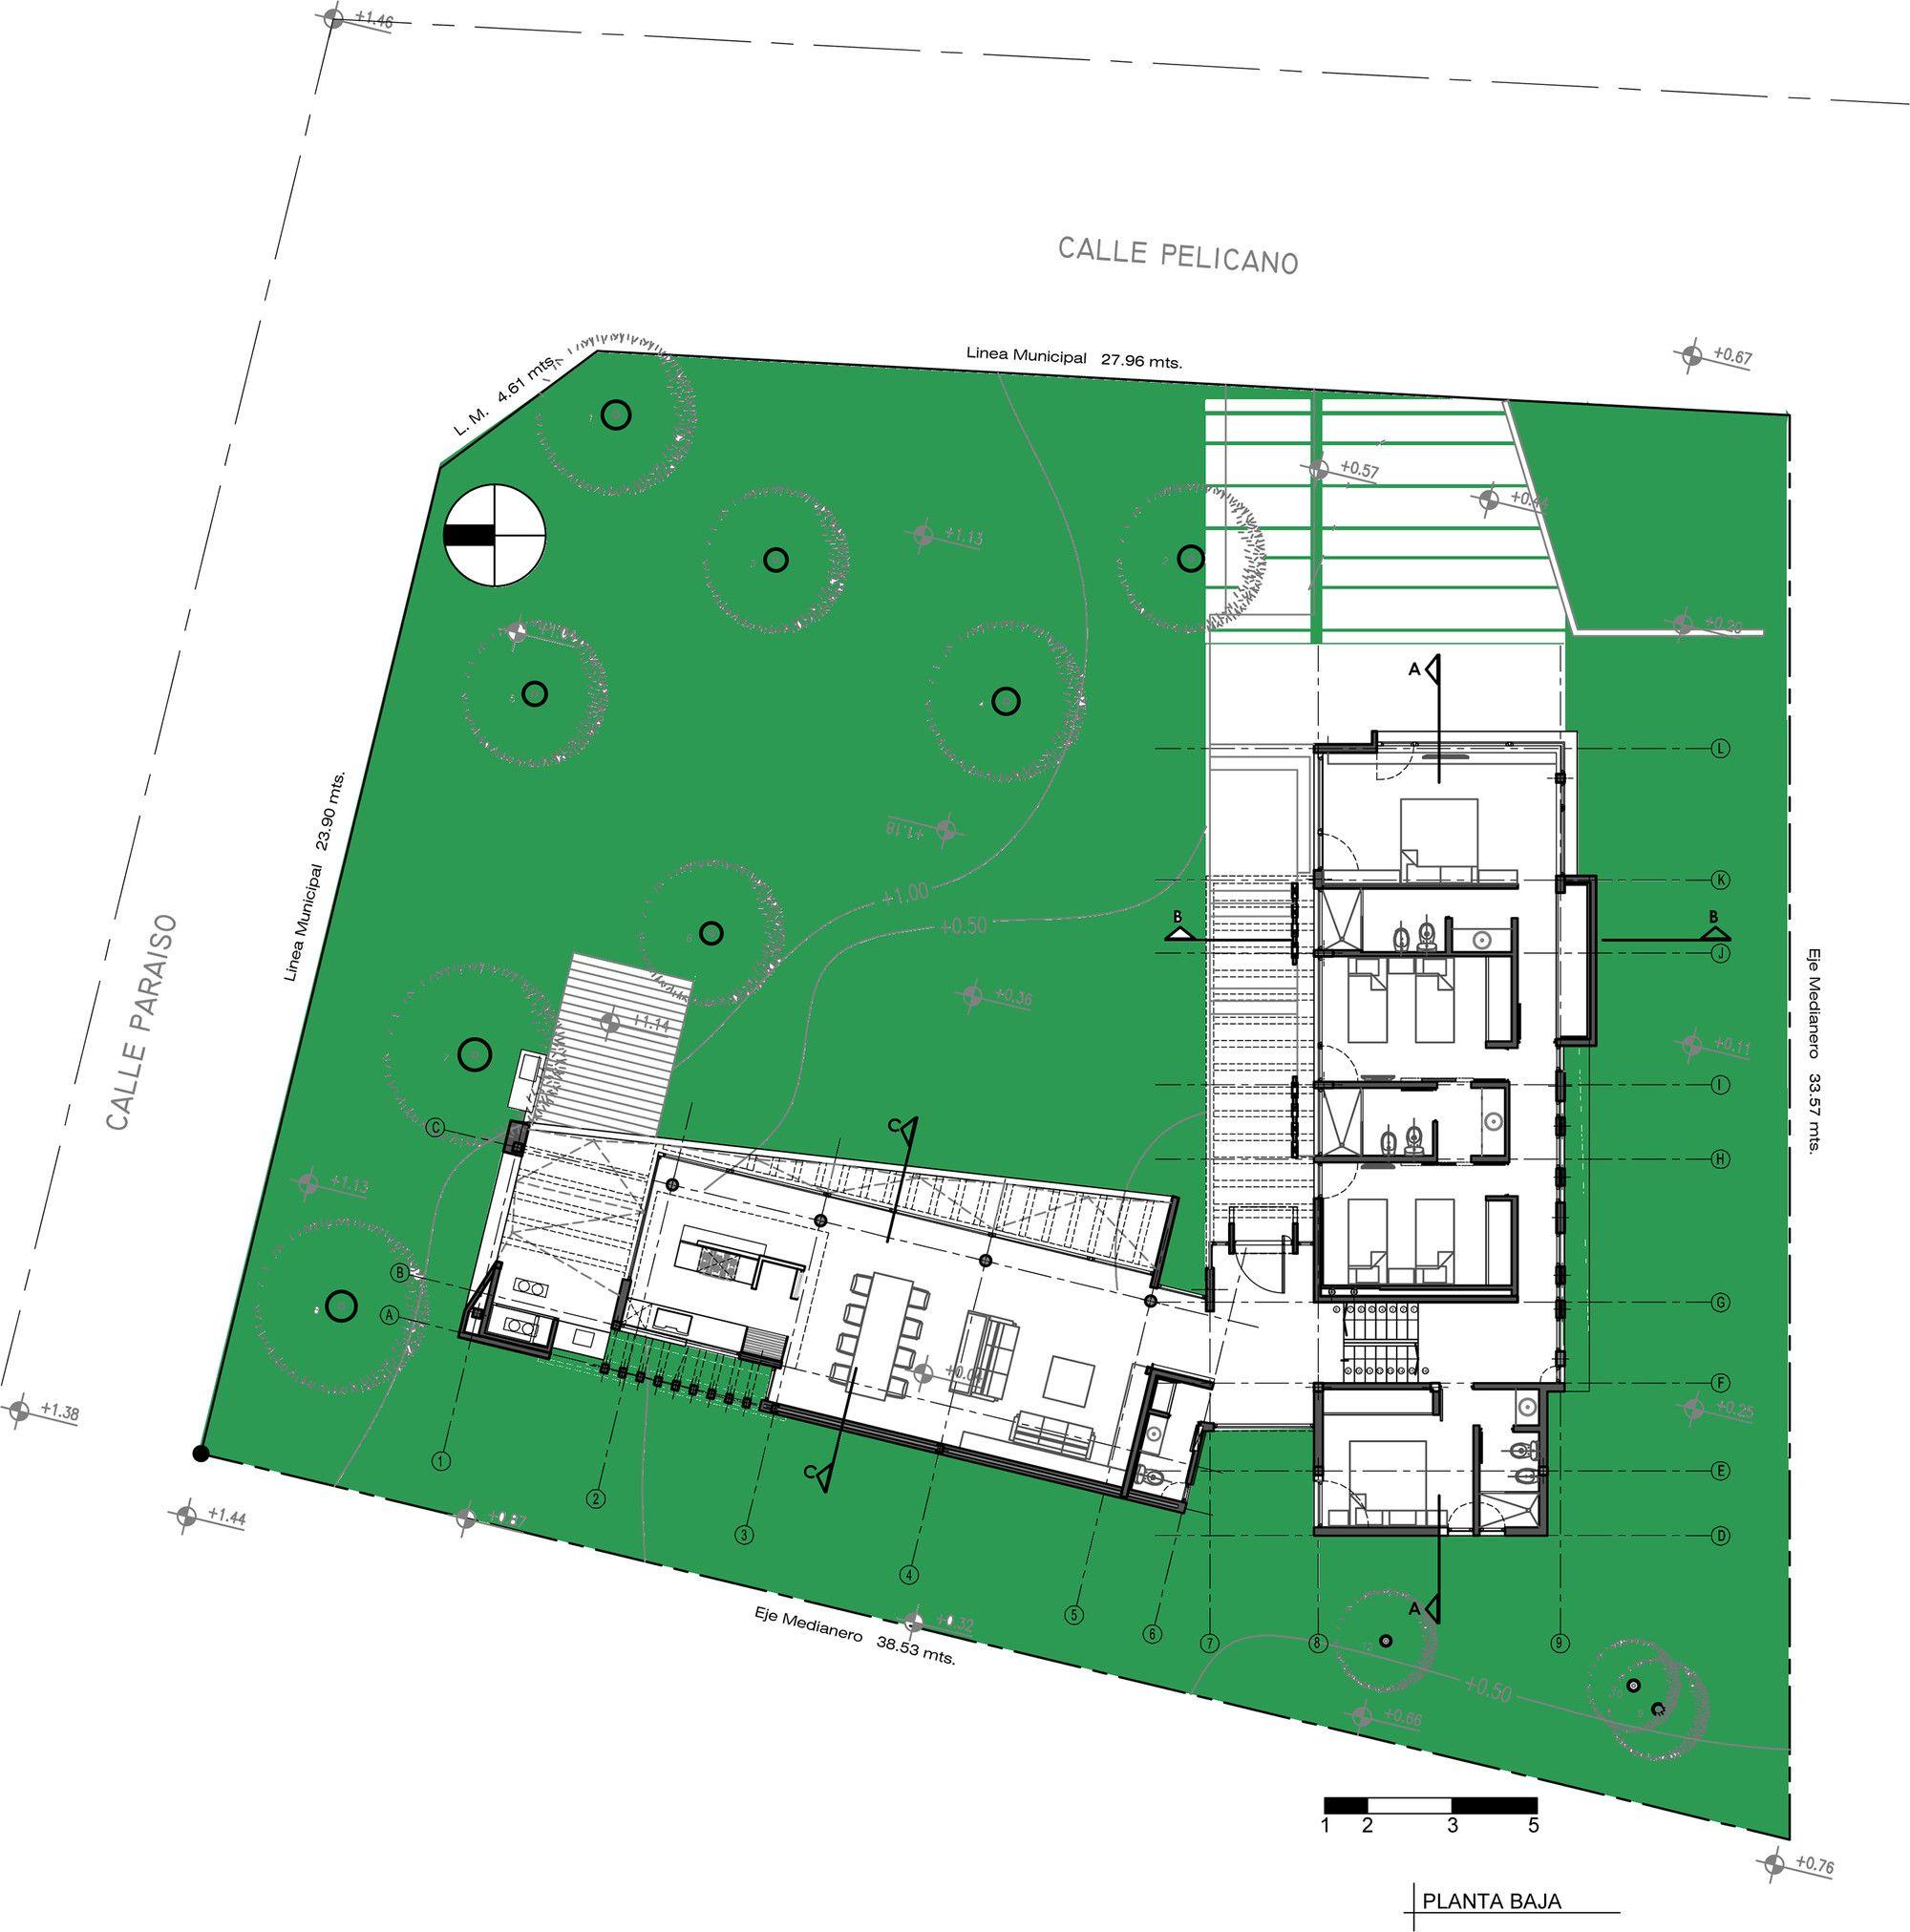 Galeria De Casa Pelicano Estudio Galera 16 Floor Plans Ground Floor Plan How To Plan